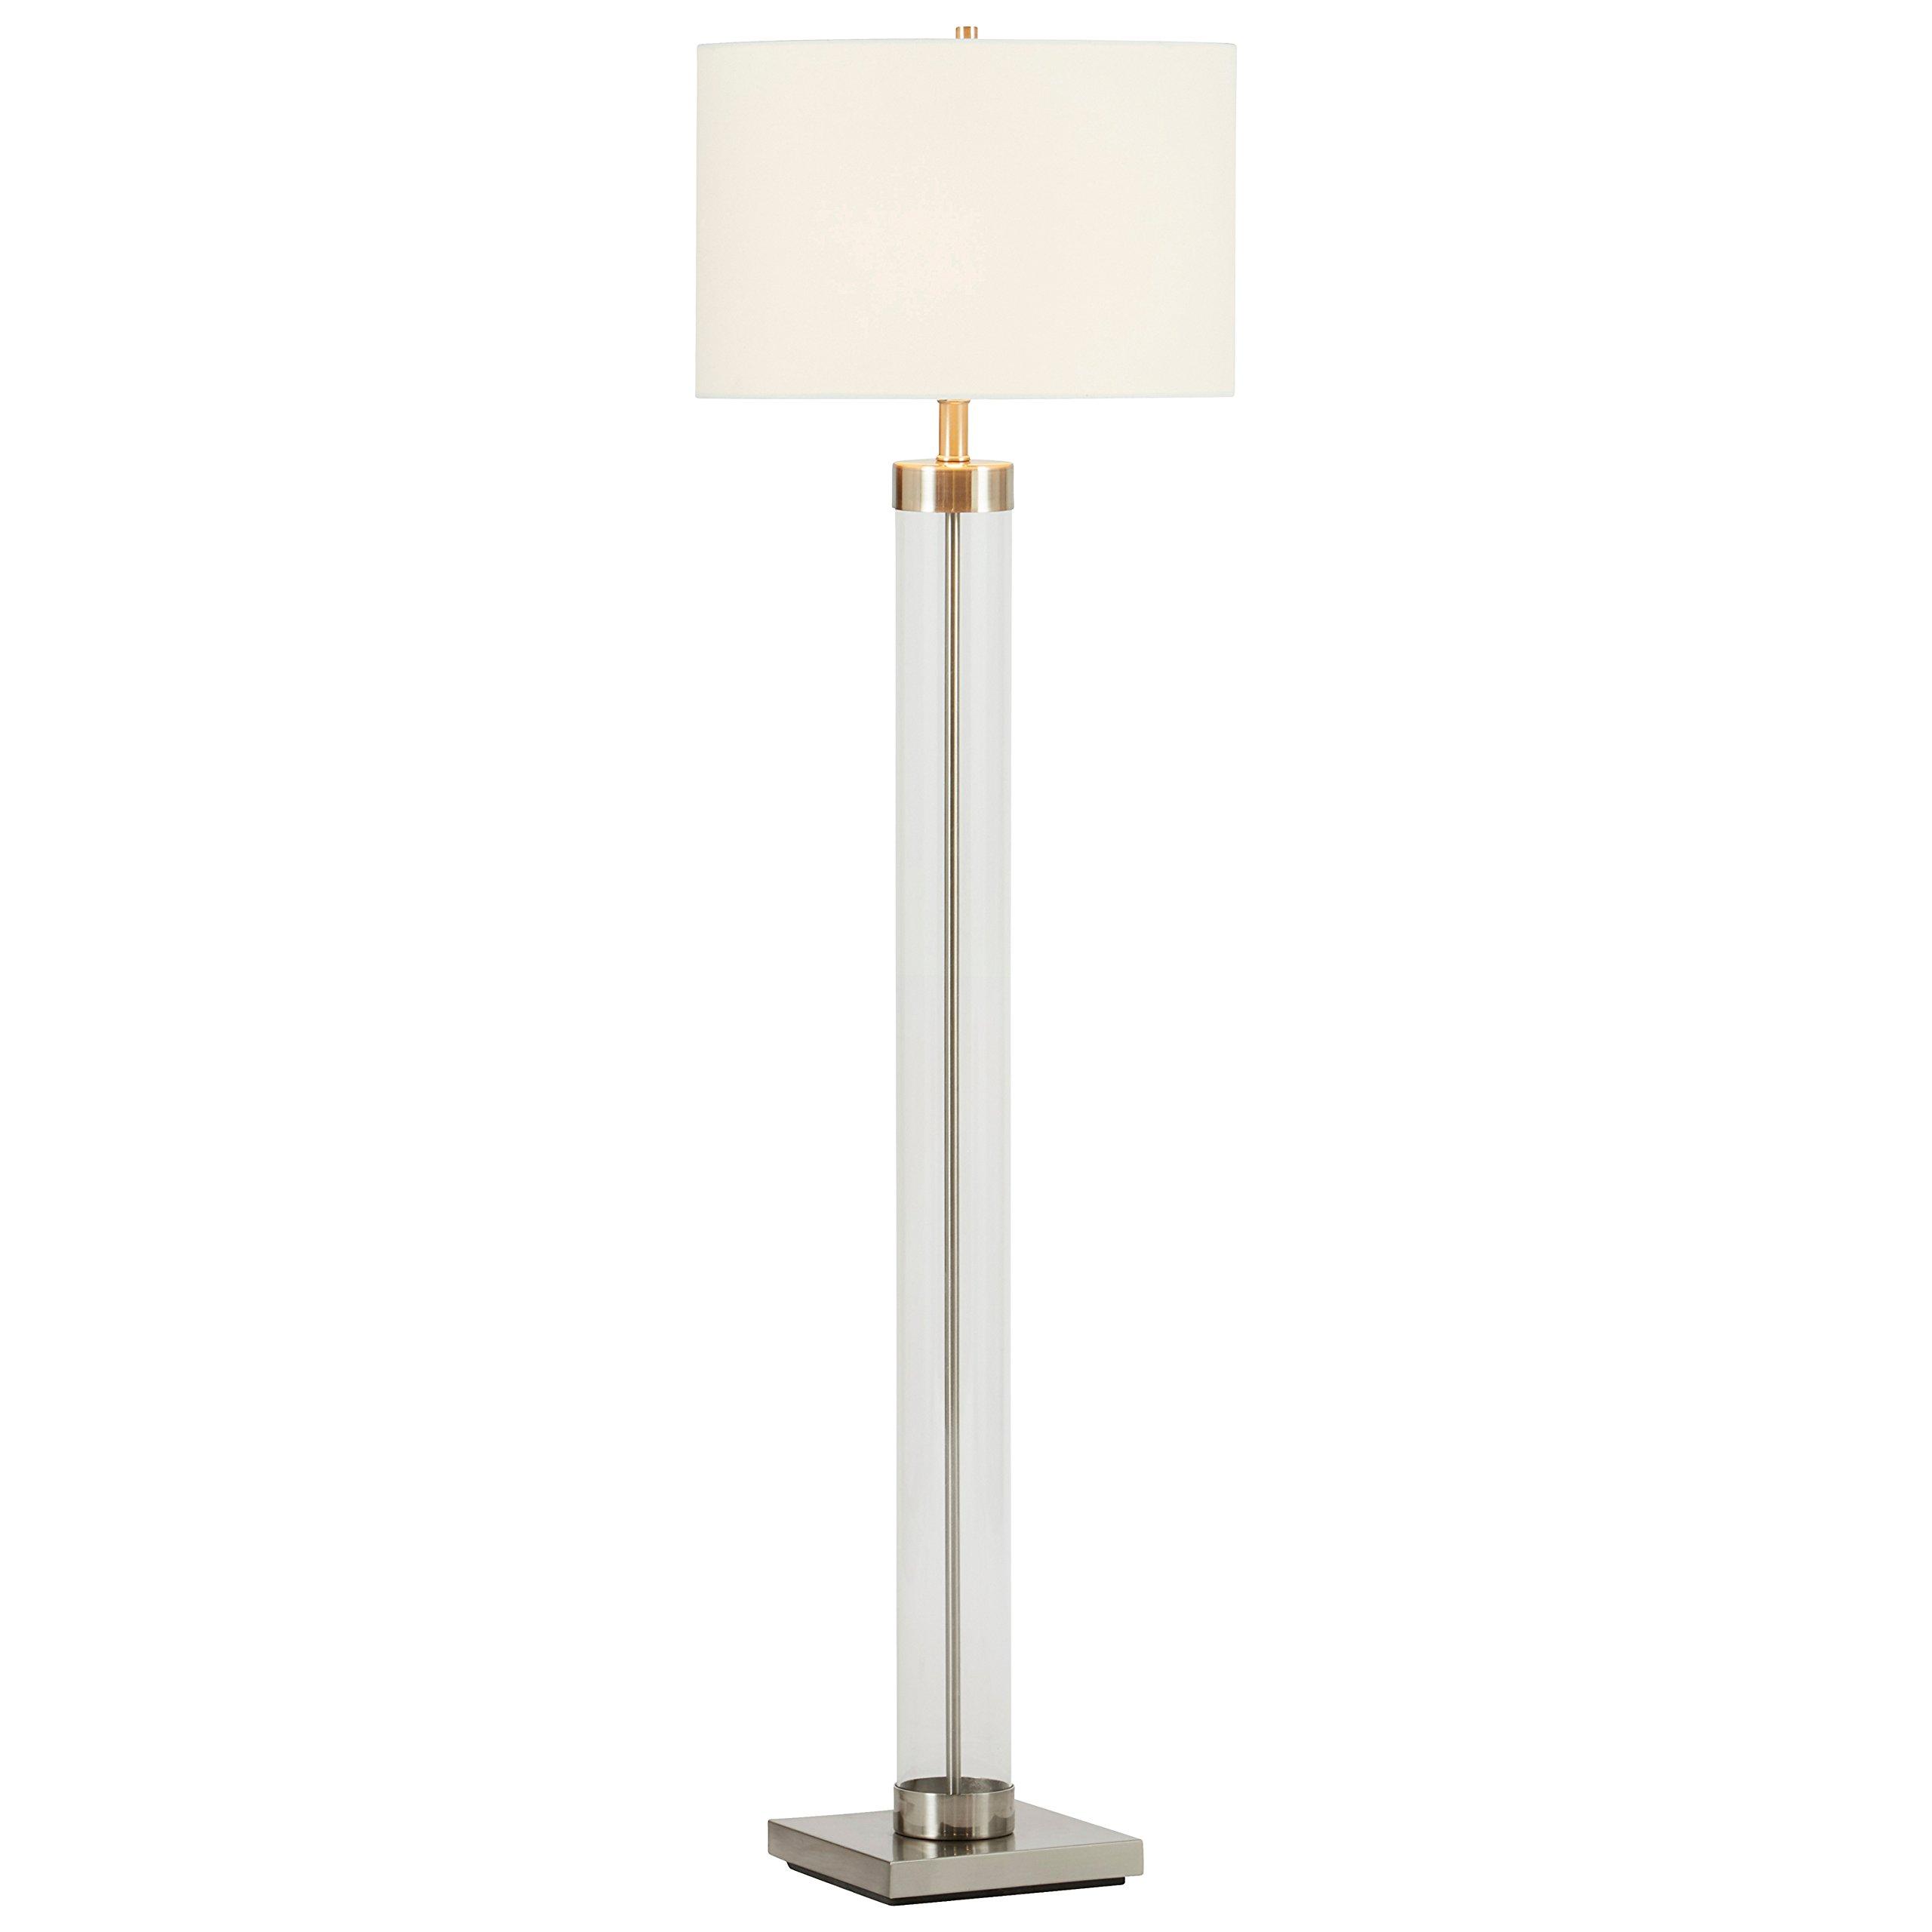 Stone & Beam Glass Column Nickel Floor Lamp, 59''H, With Bulb, White Shade